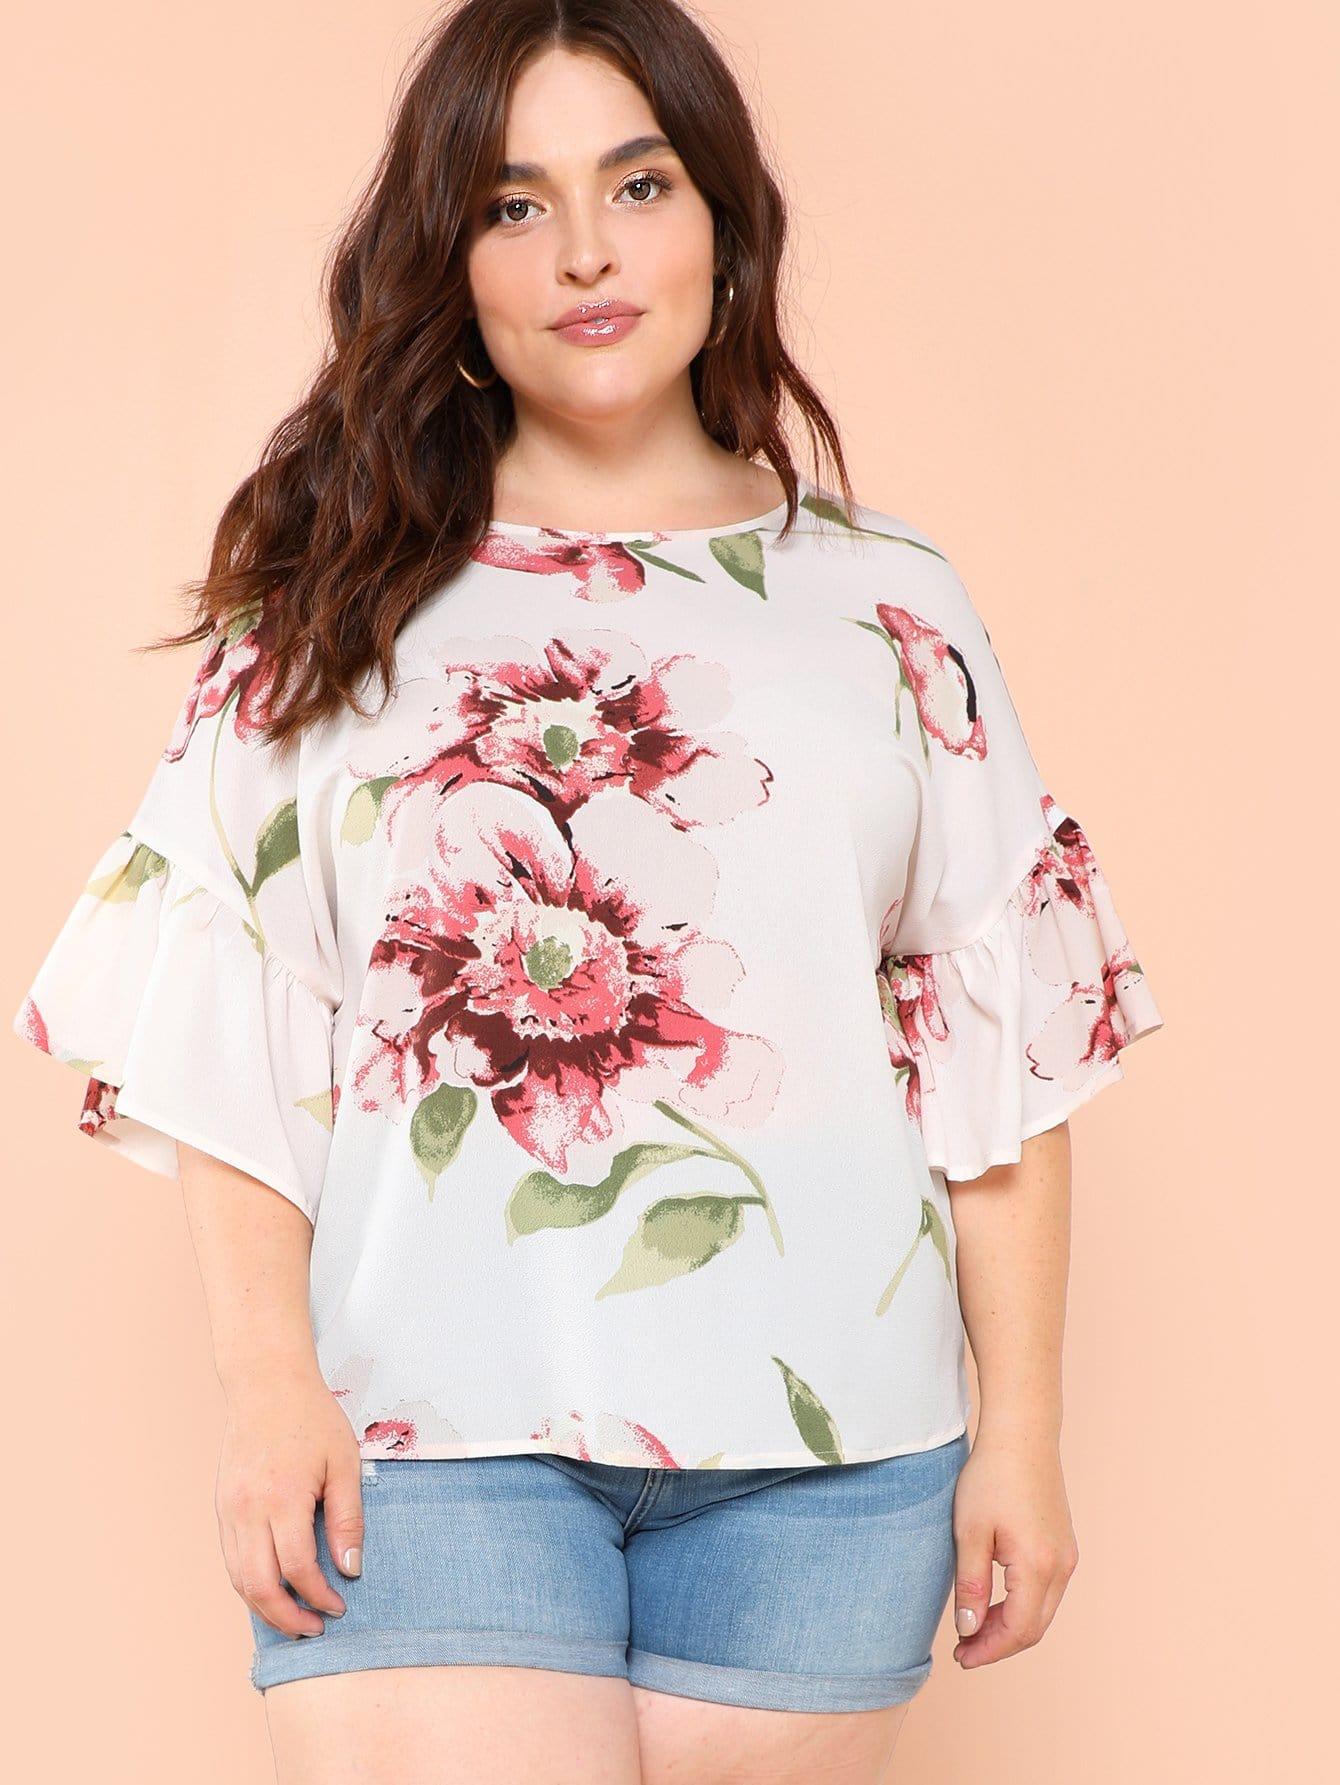 Купить Ruffle Sleeve Floral Вверх, Brianna Marquez, SheIn